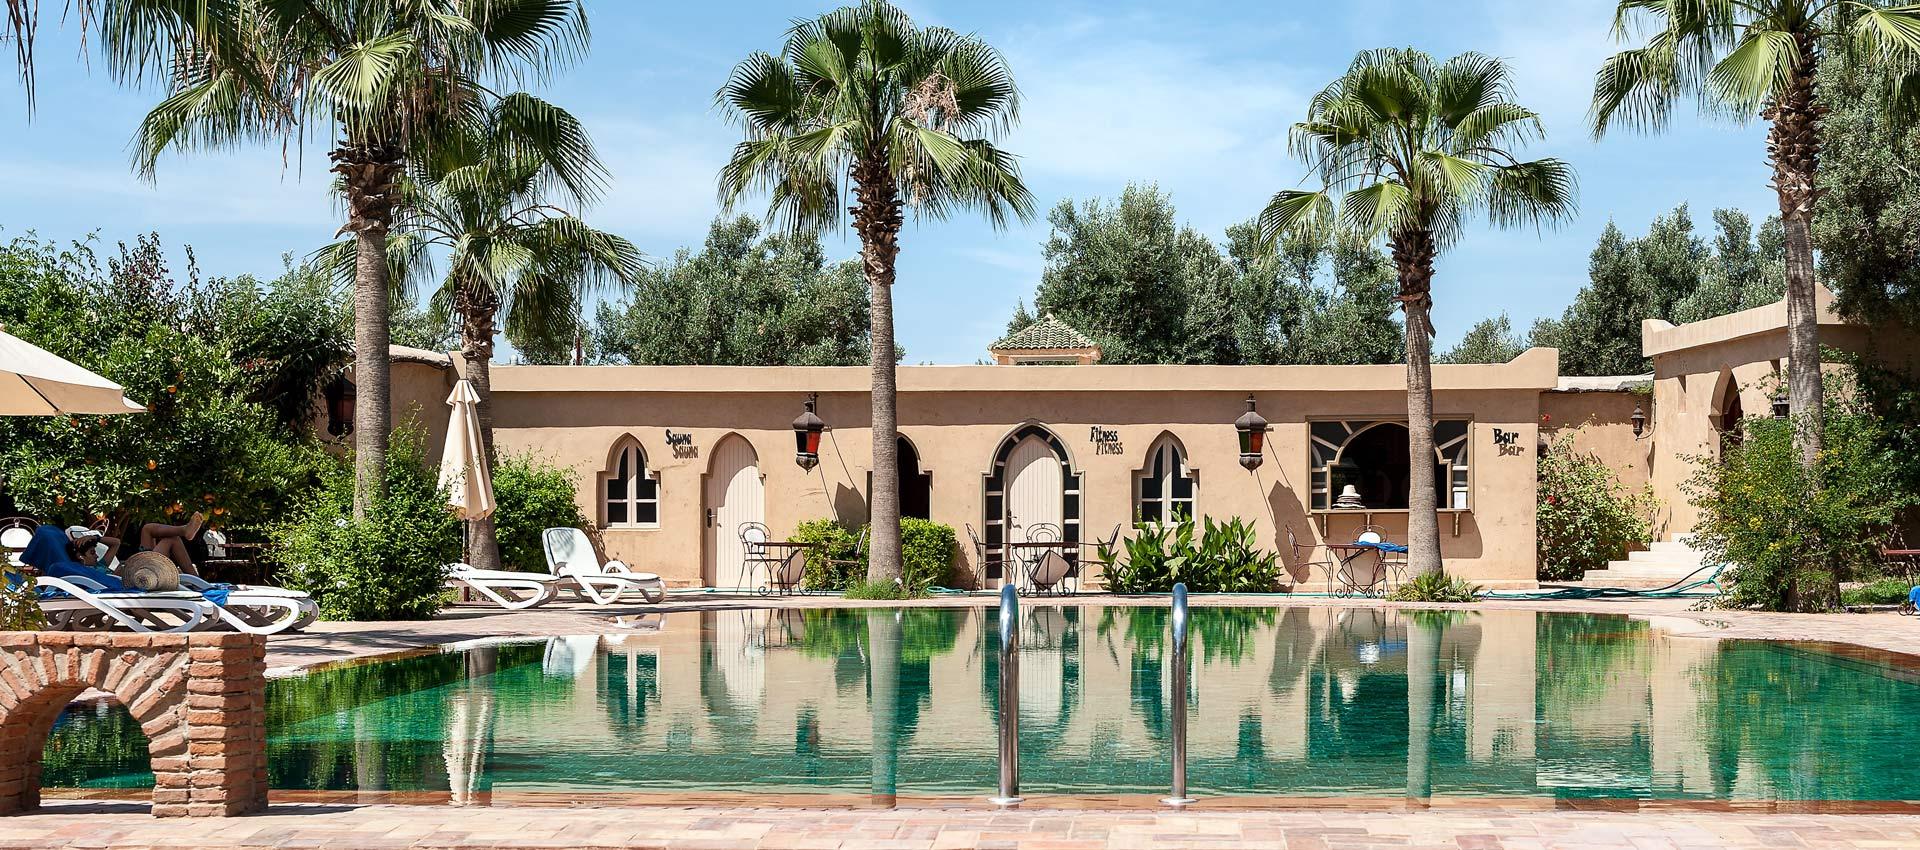 Hotel Dar Zitoune, Taroudant